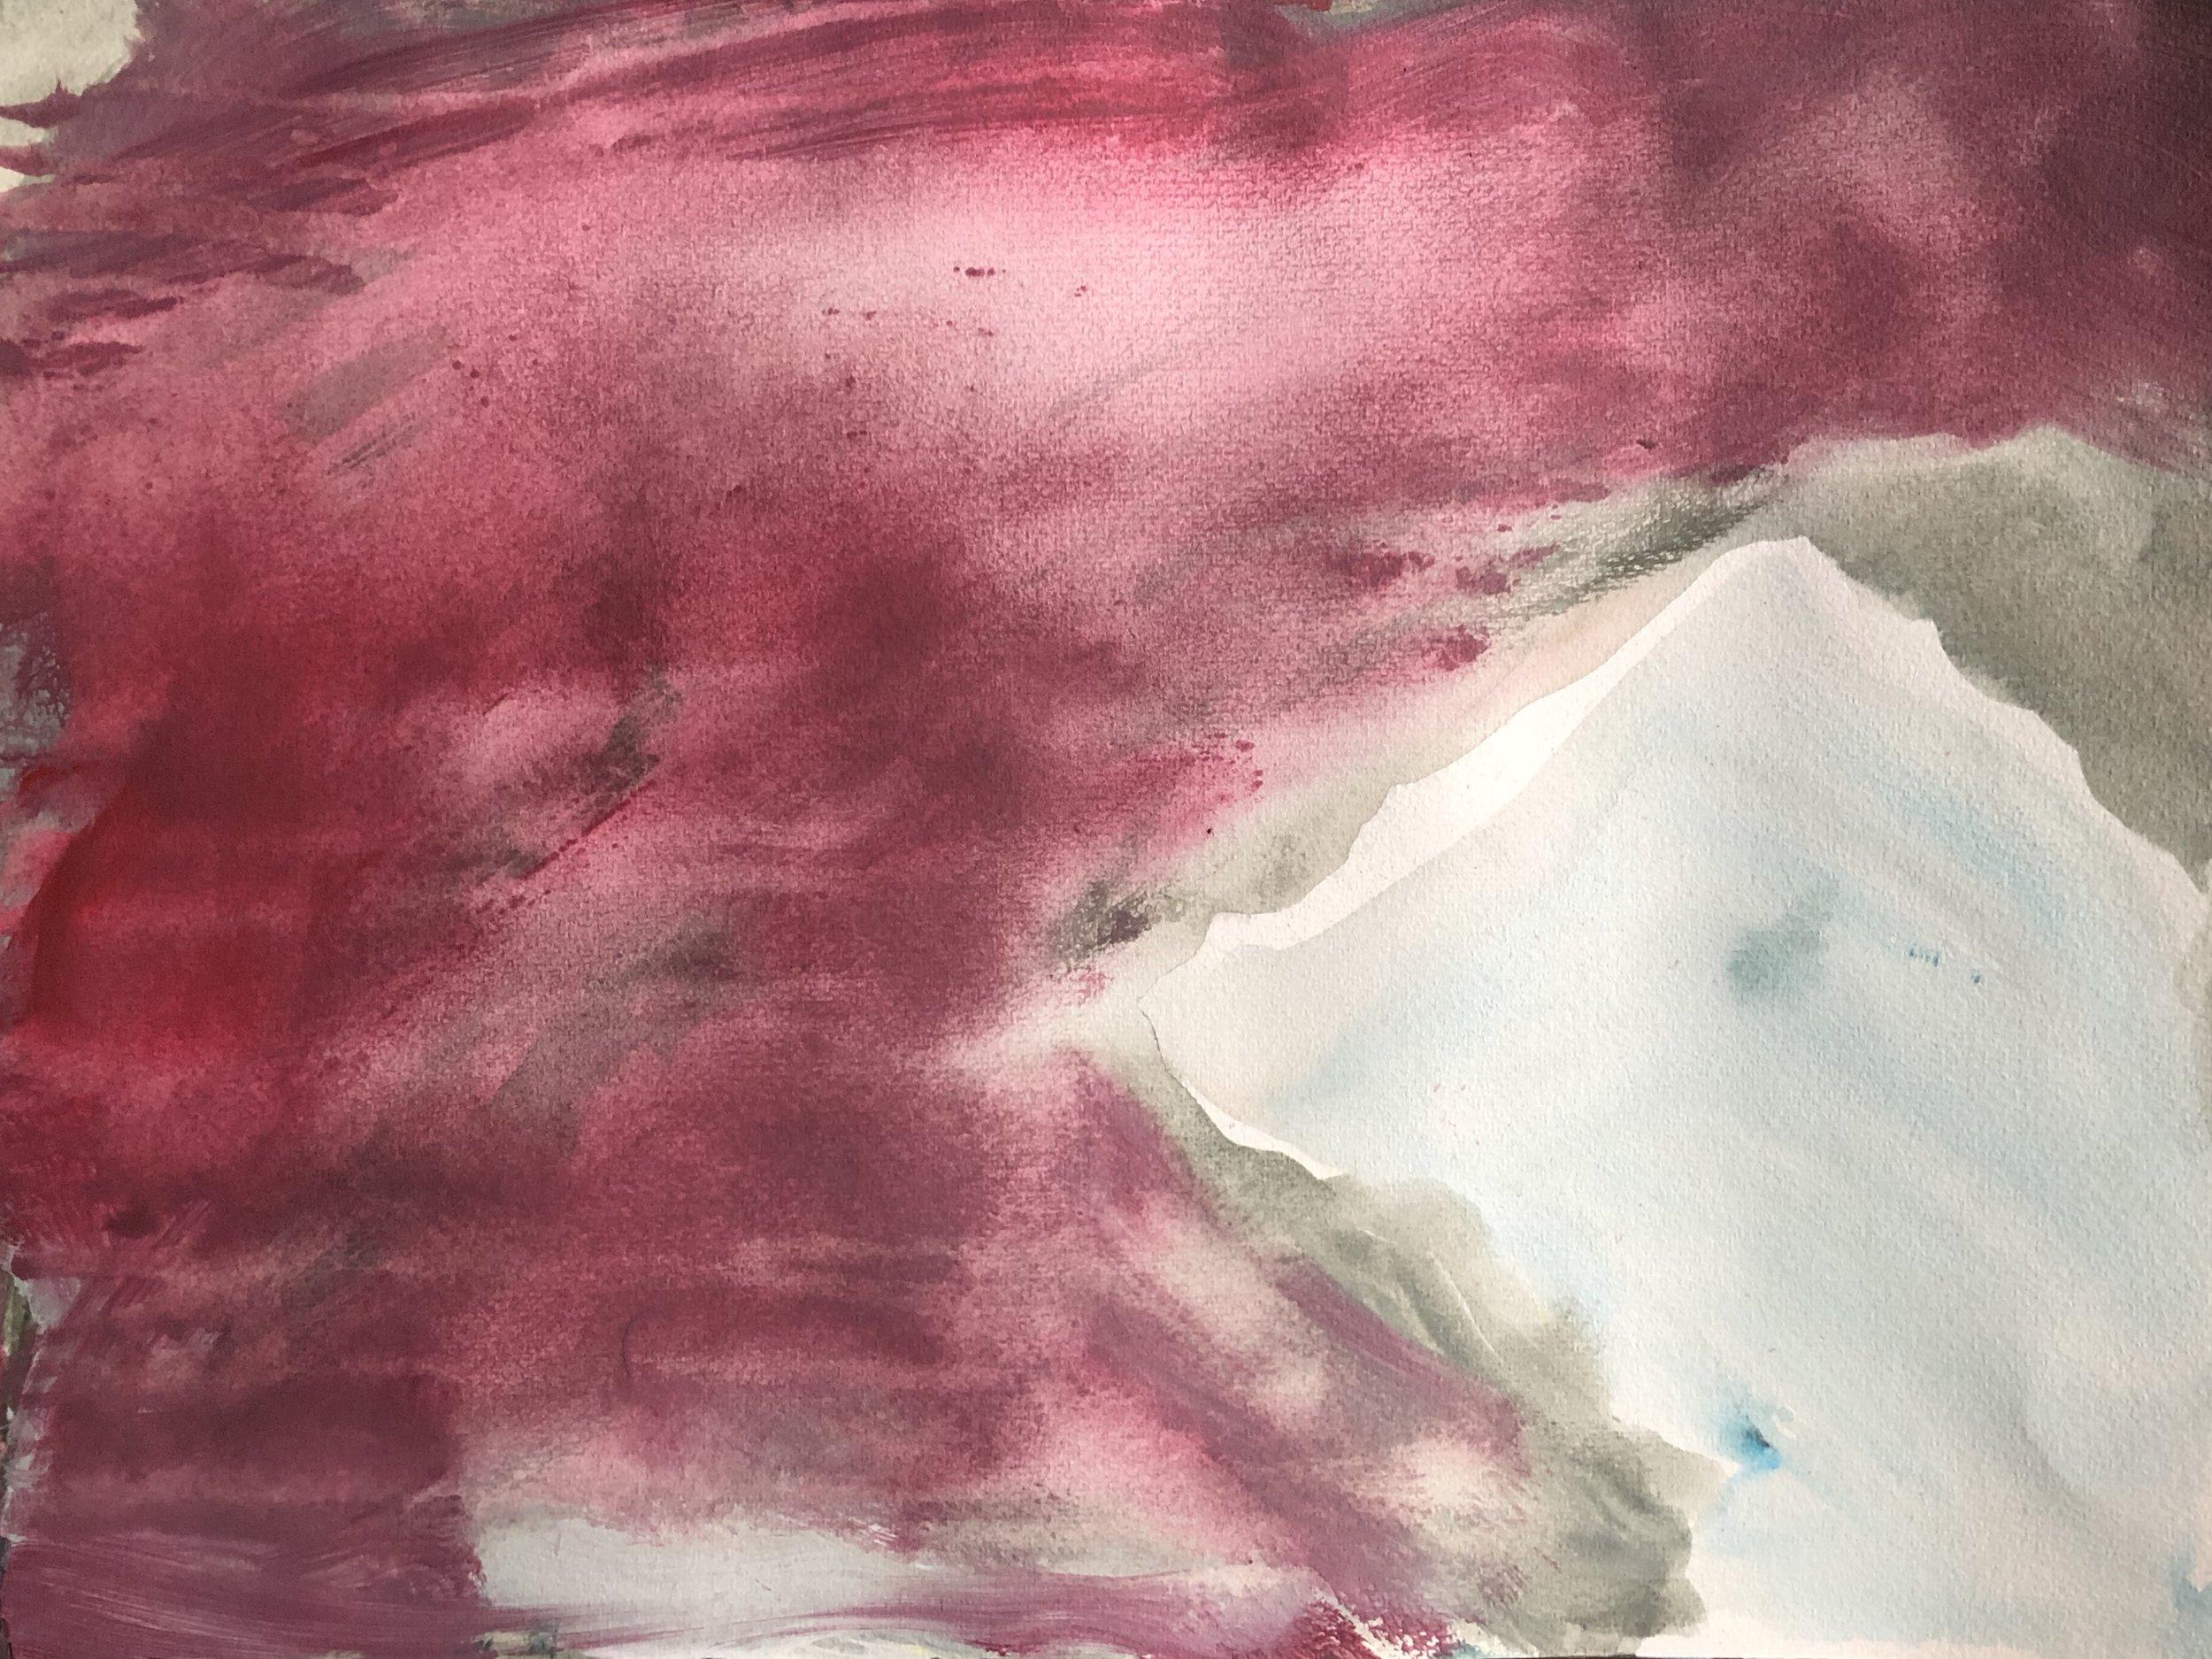 Untitled, 45cm x 25cm, Acrylic on paper